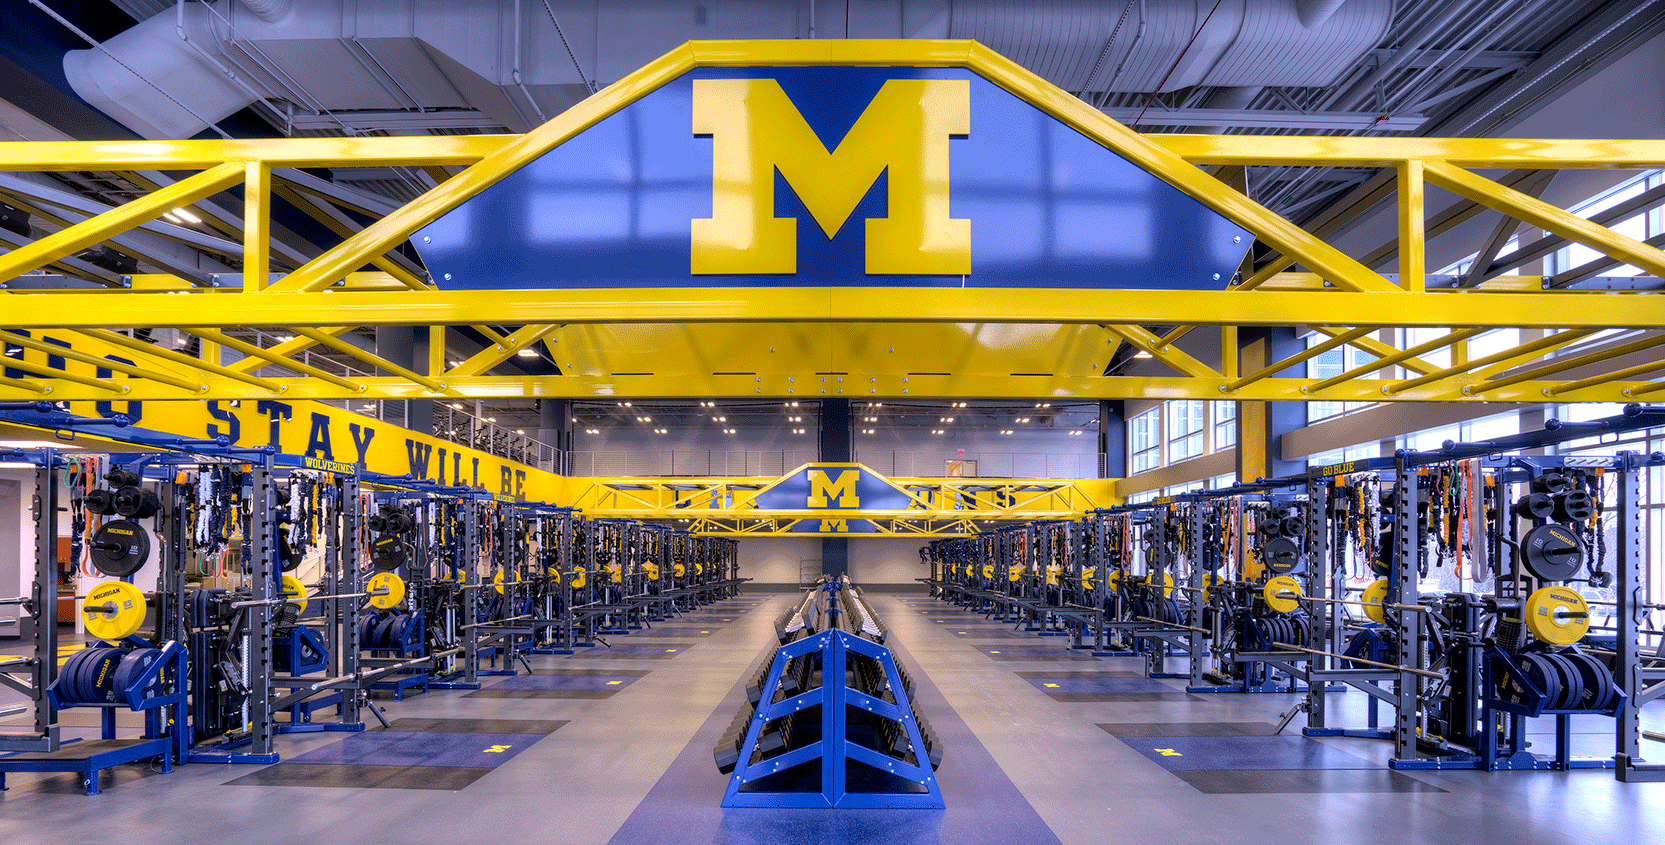 University-of-Michigan-ASCP-Weight-Room-2-1665x845